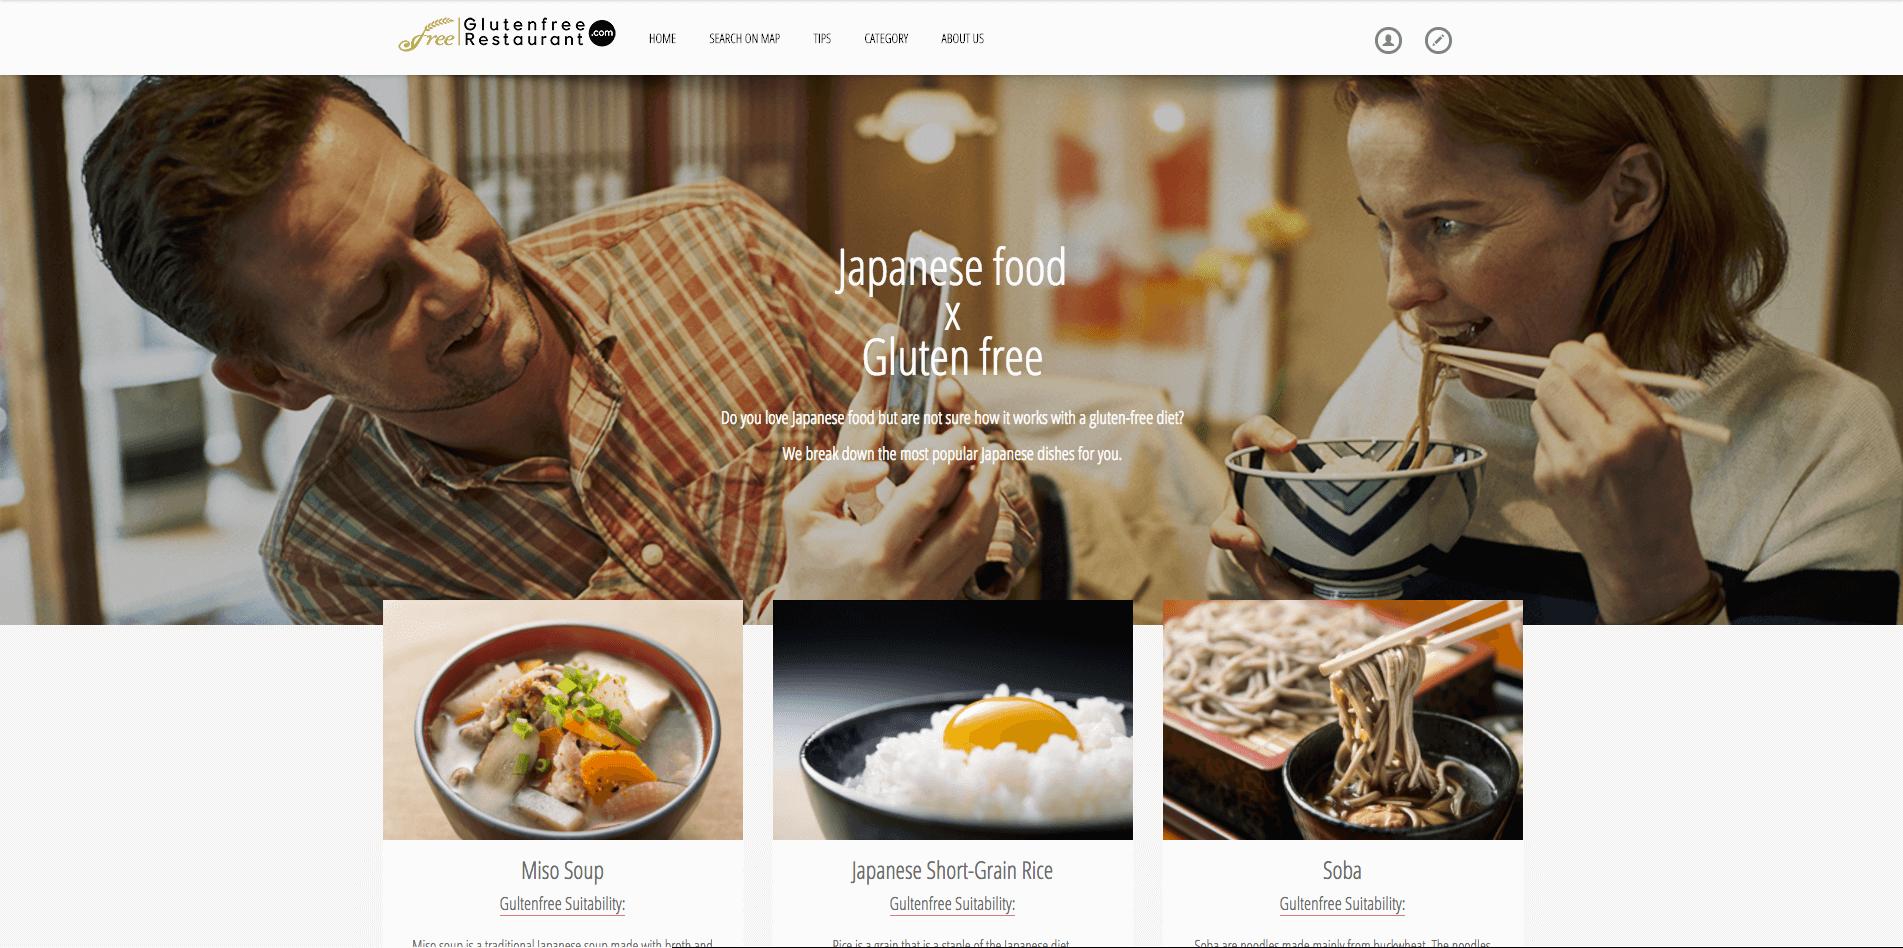 japanesefood-glutenfree